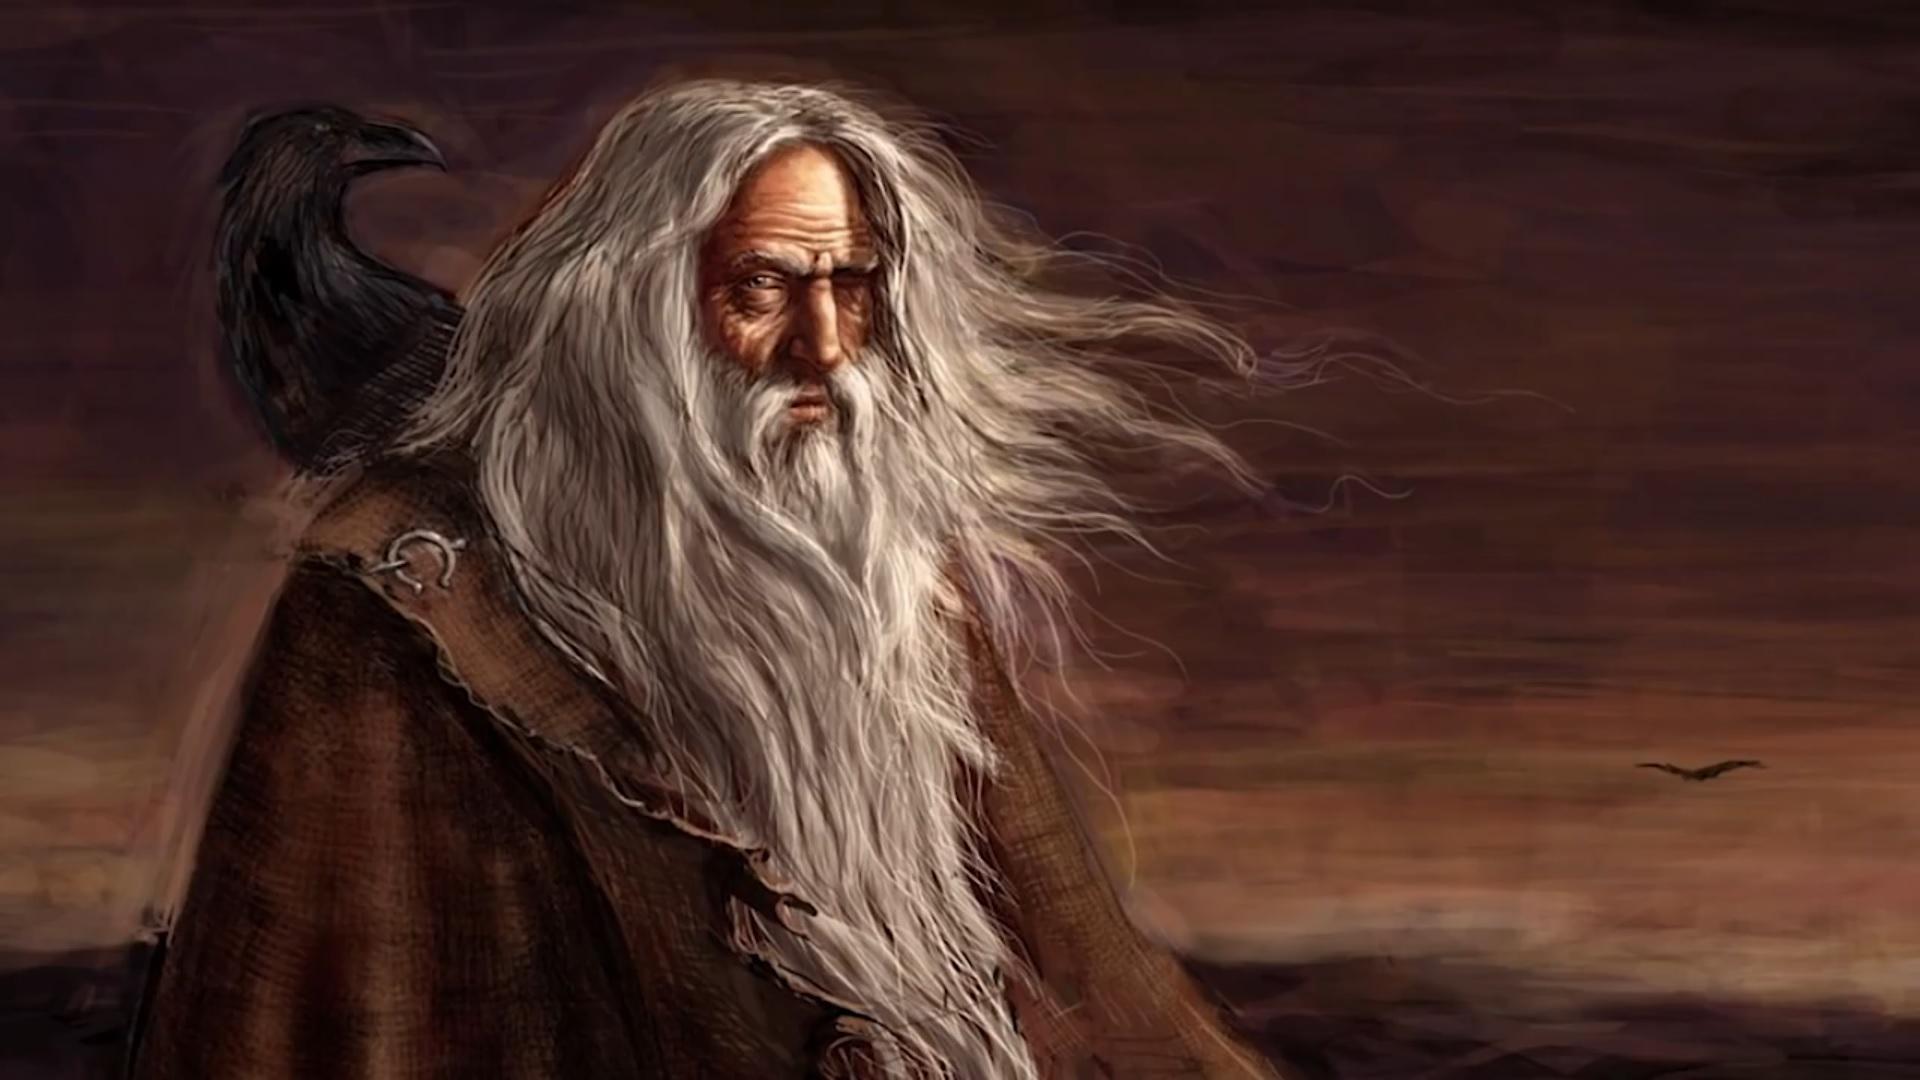 Exploring Norse Mythology: Odin (Изучение скандинавской мифологии: Один)